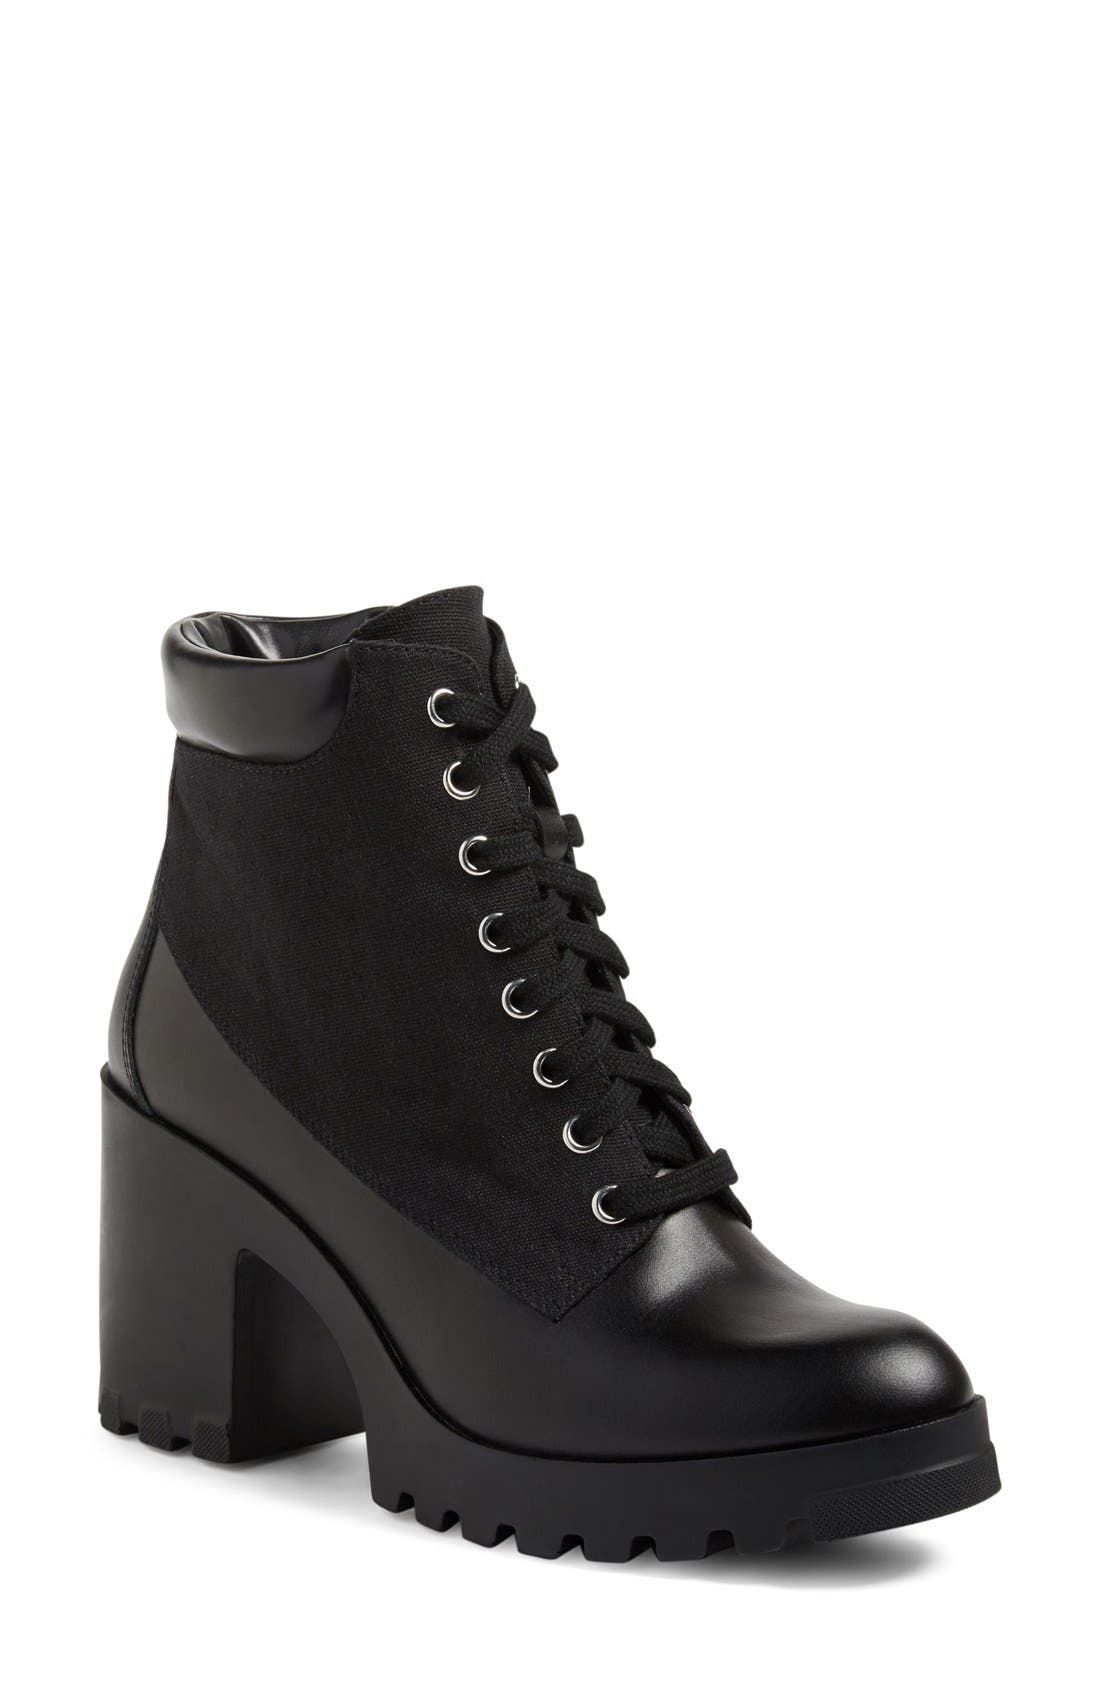 Main Image - BP. Madison Lace-Up Boot (Women)